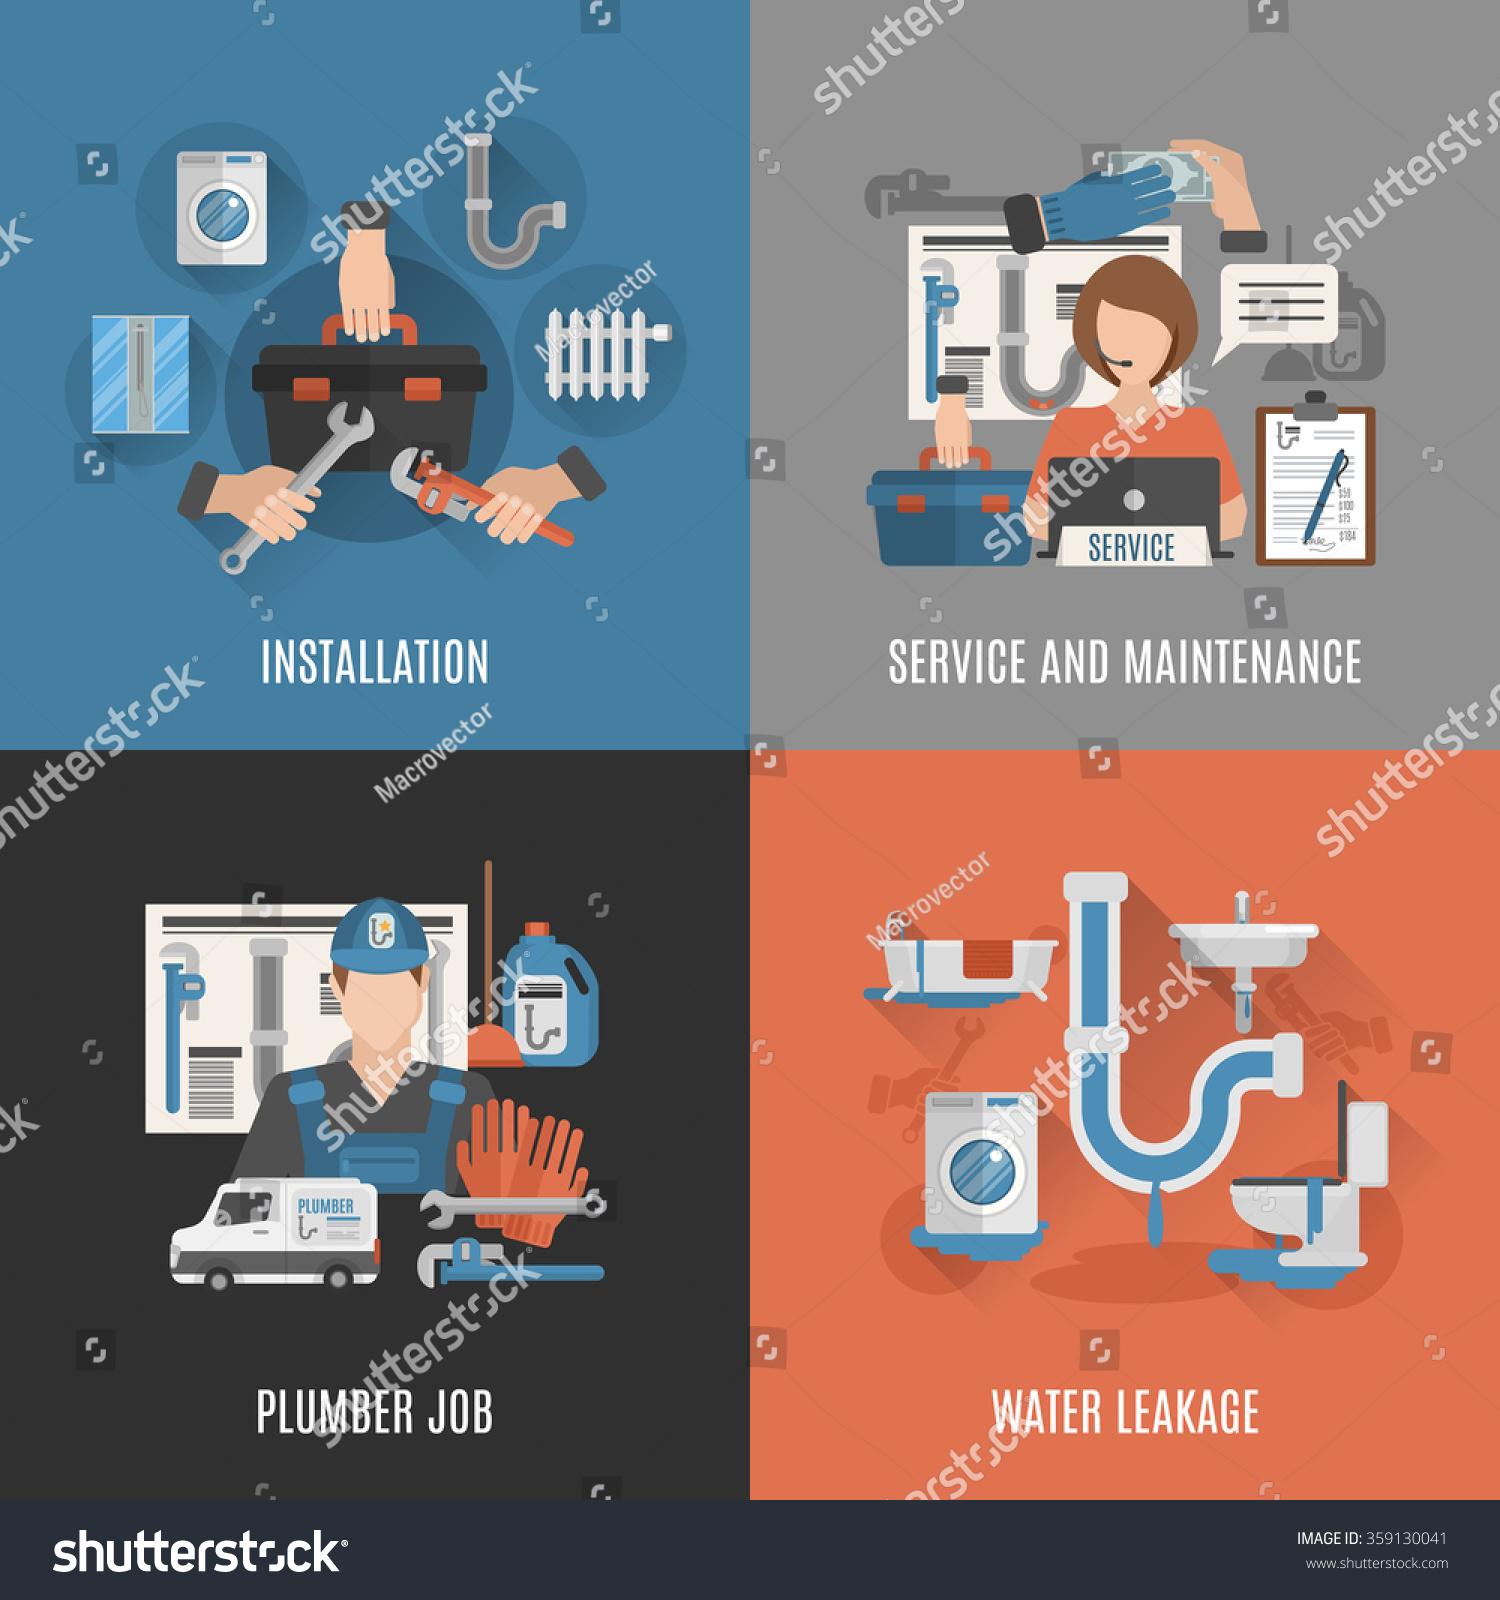 Vector E Sanitary Service : Online plumbing service sanitary installations maintenance